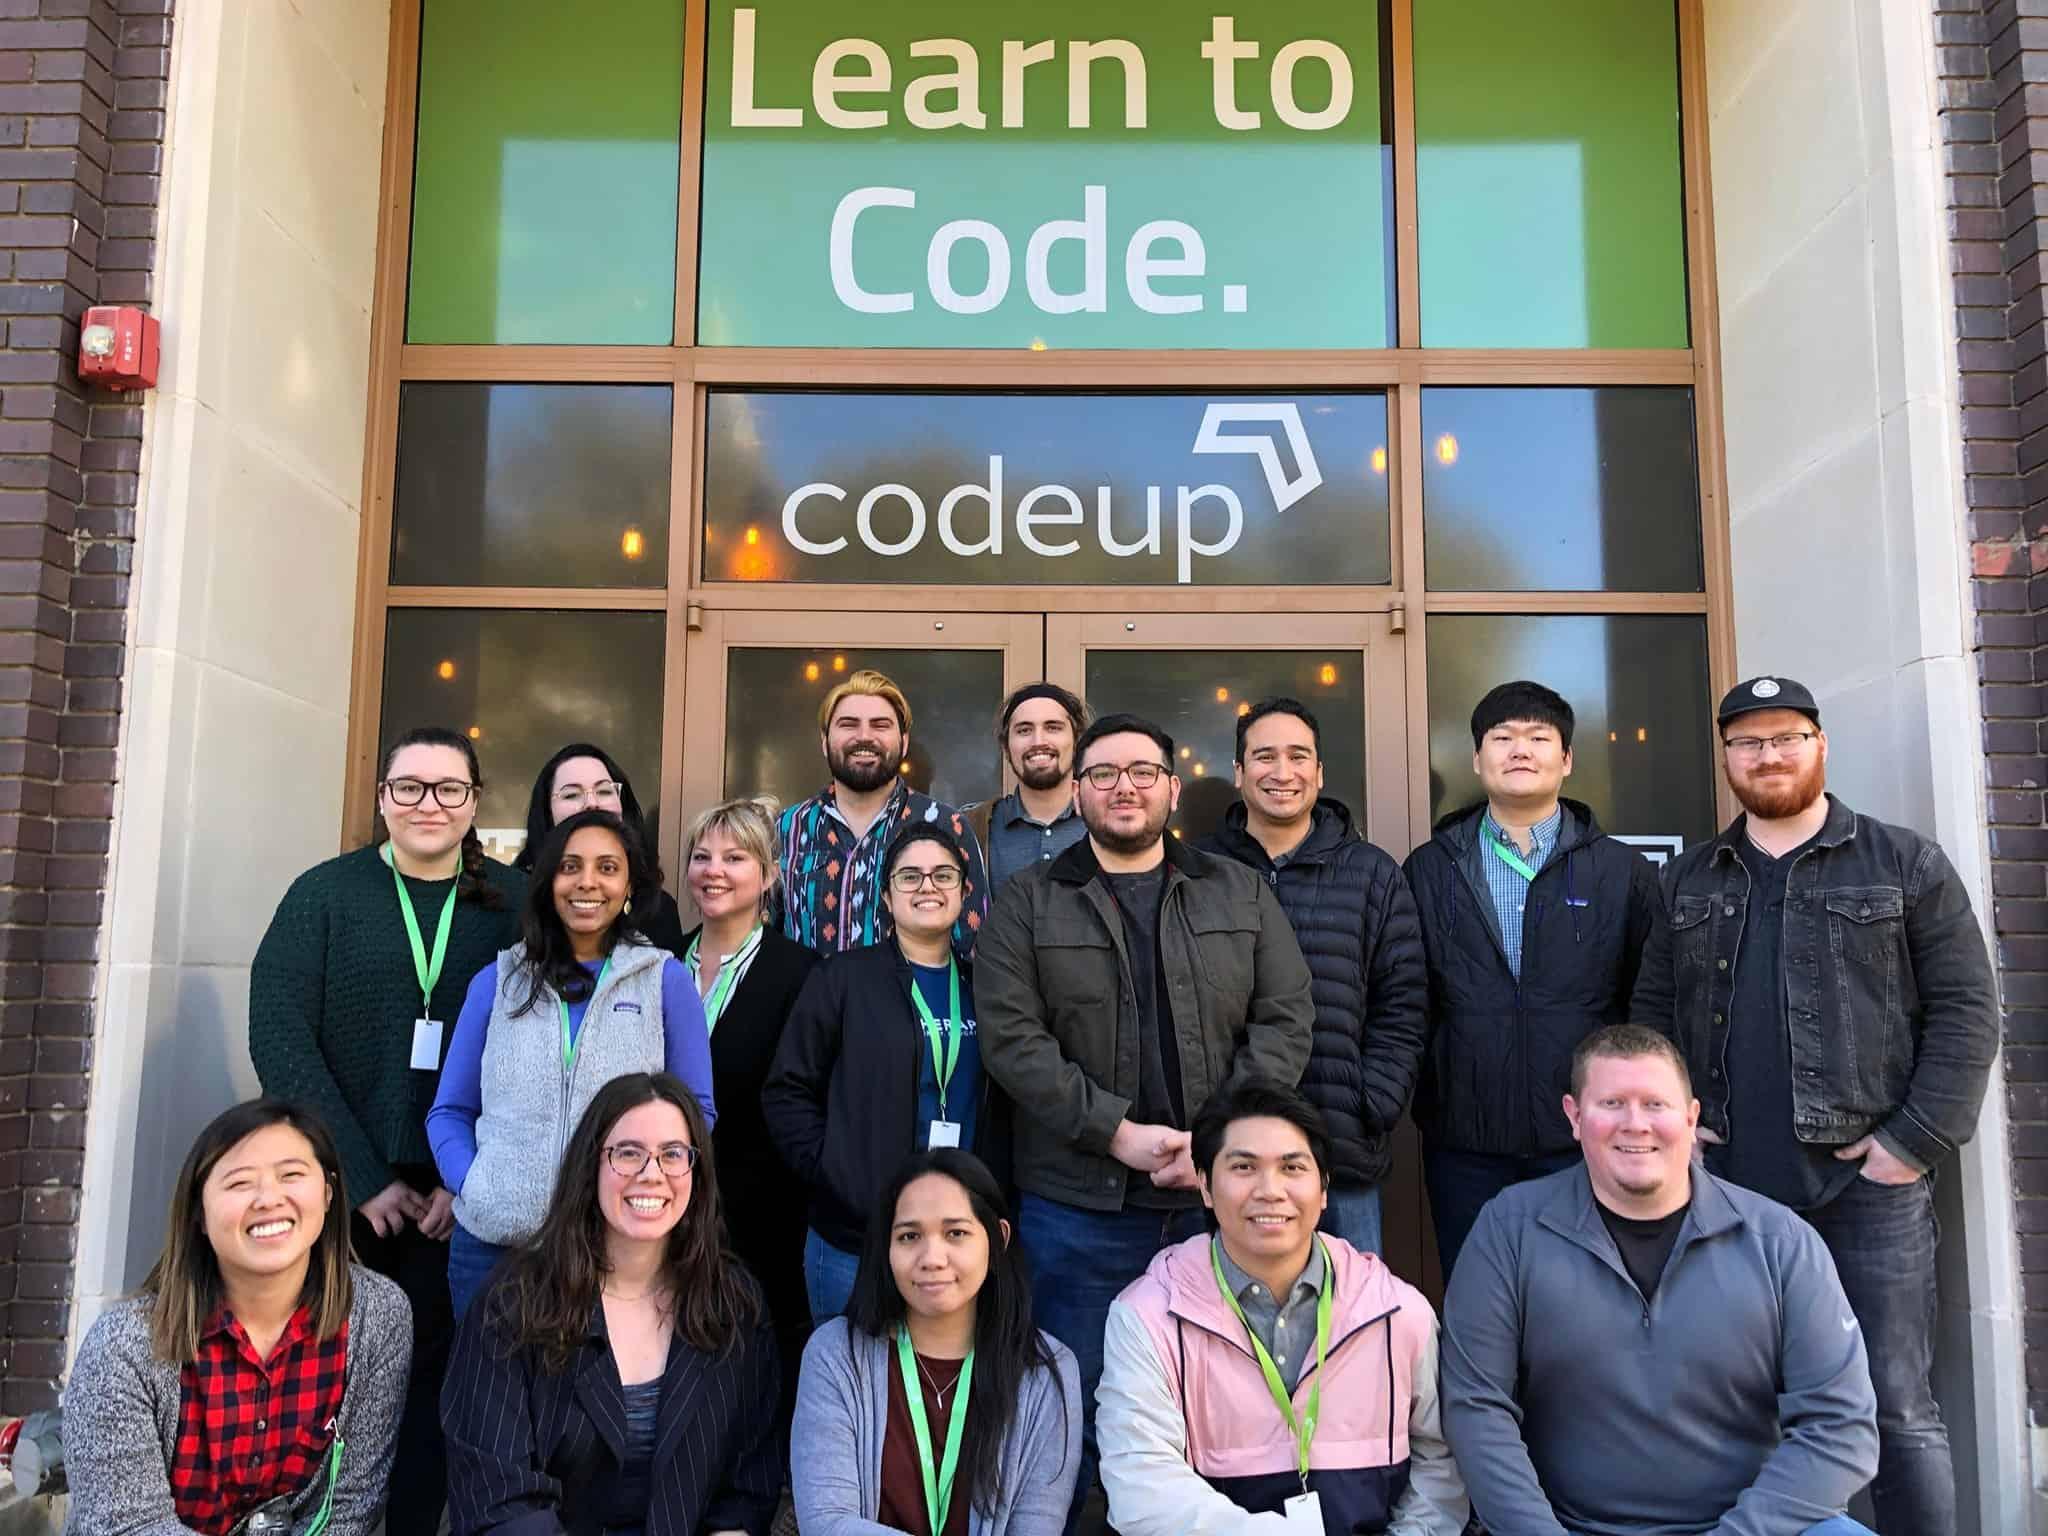 Codeup students